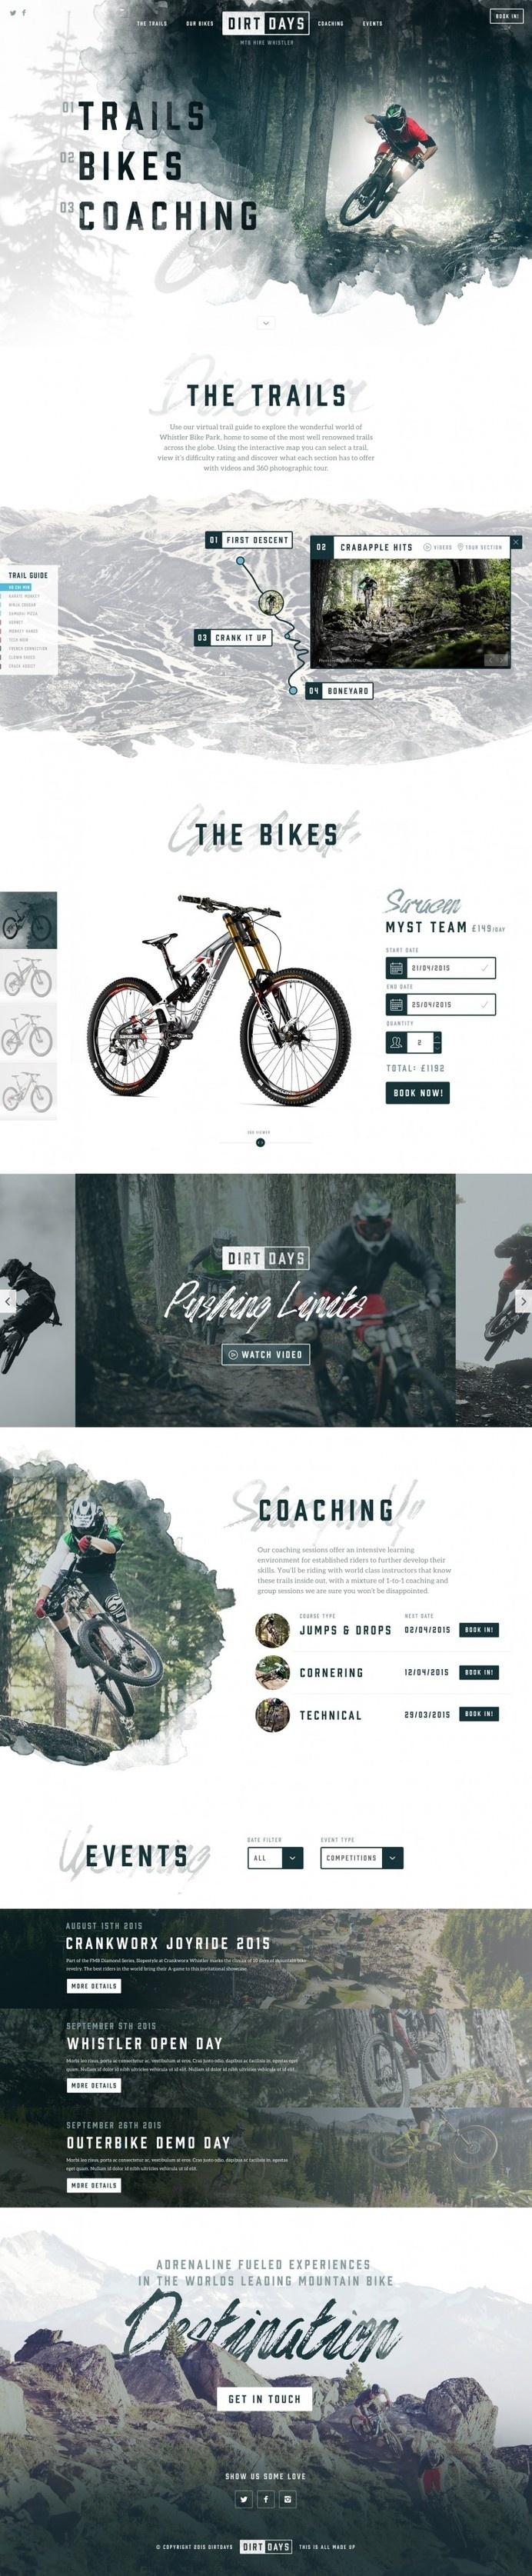 Dirtdays Website Concept #design #web #ux #ui